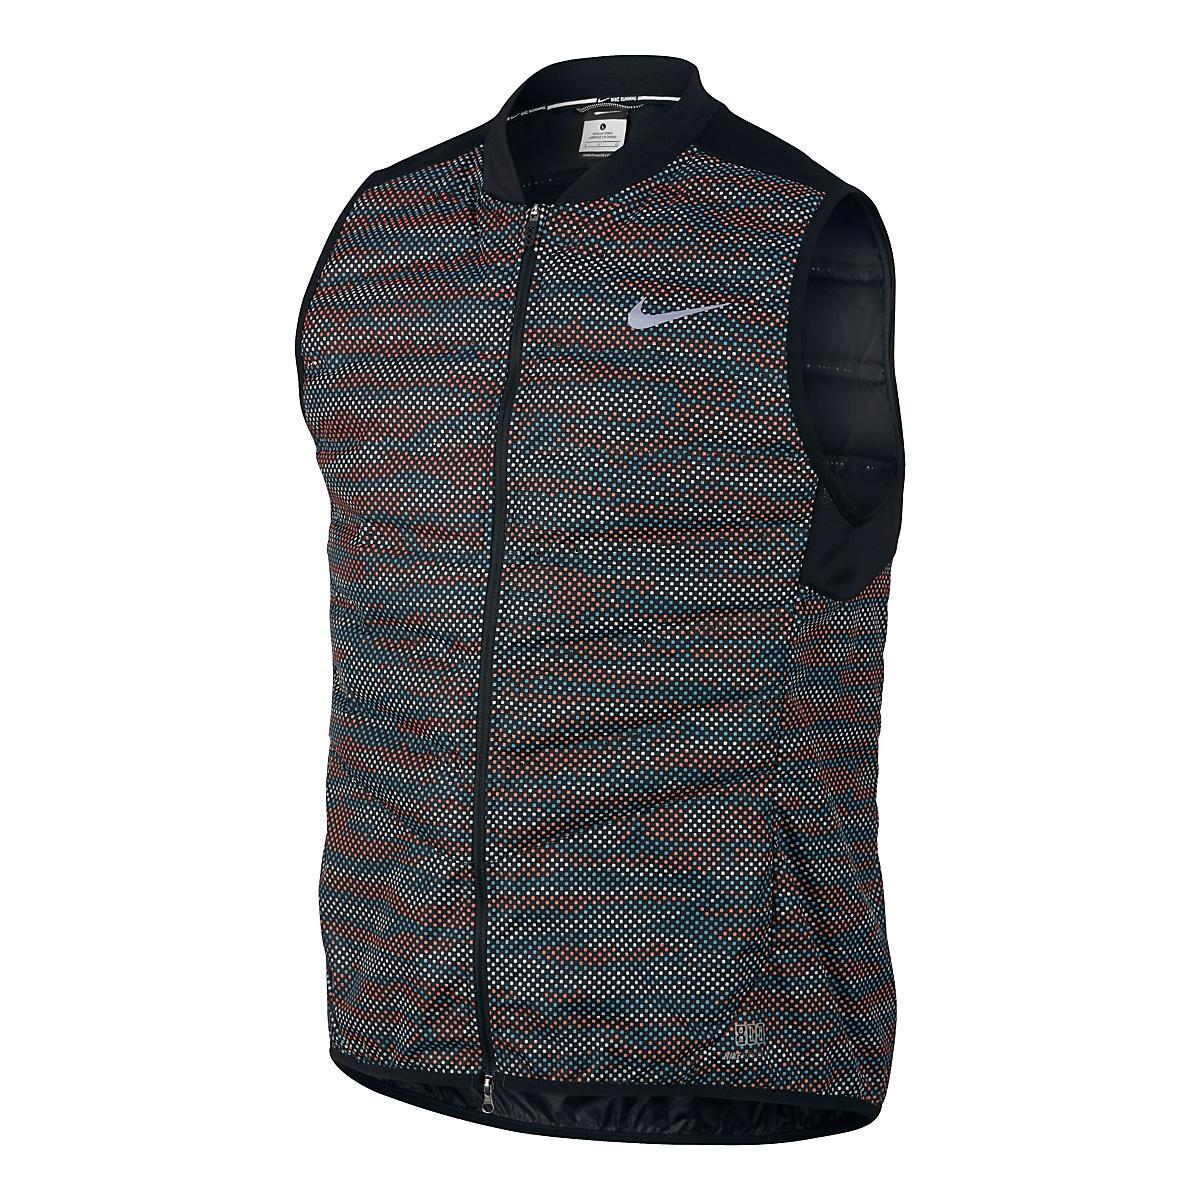 dba77e987dc0 Mens Nike Aeroloft Flash Running Vests at Road Runner Sports